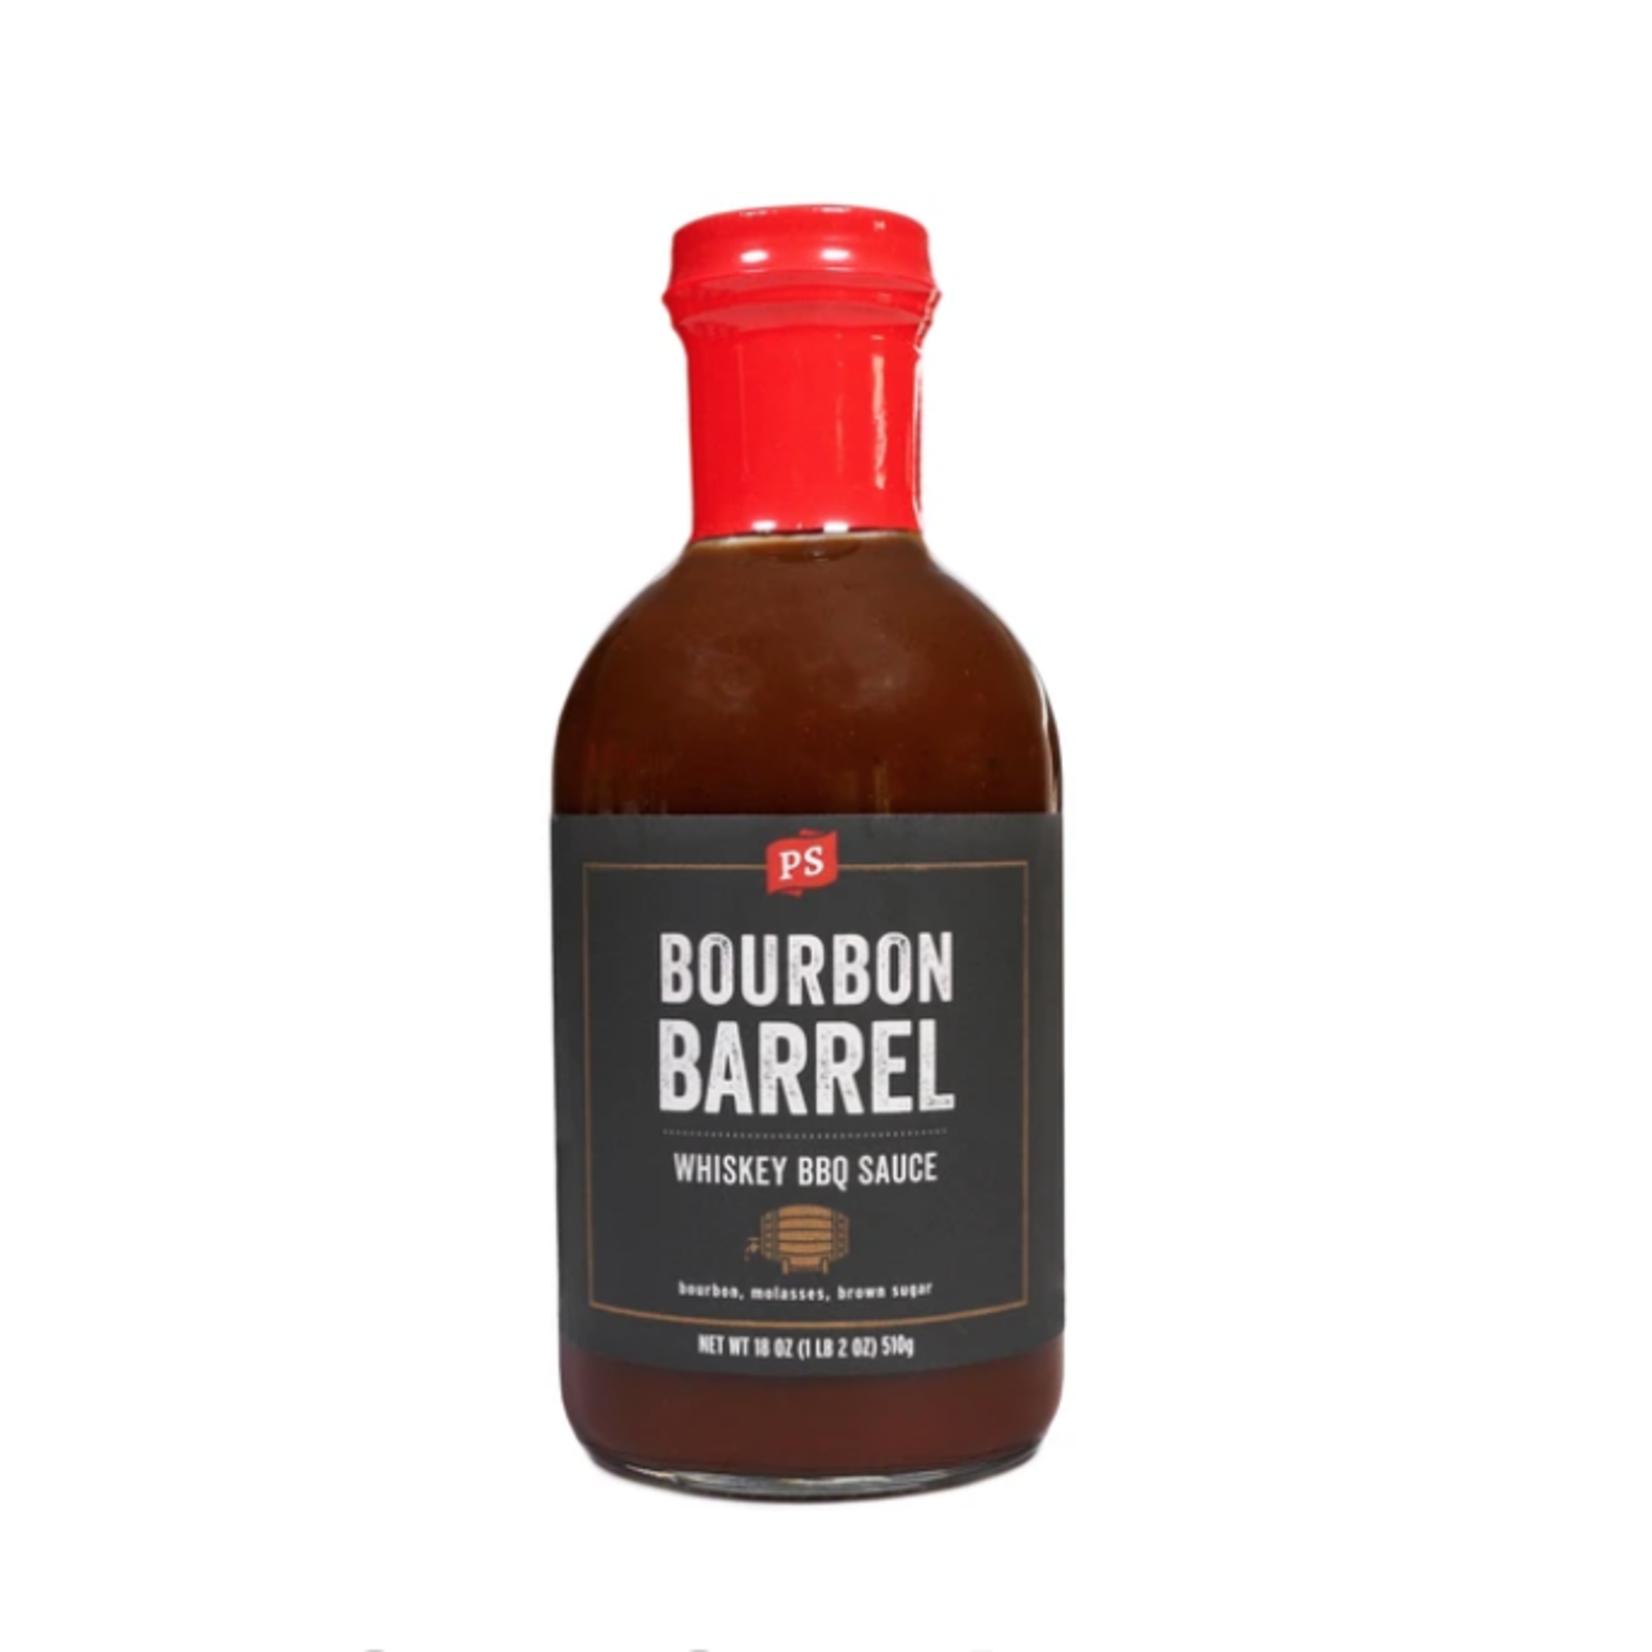 PS Seasoning Bourbon Barrel BBQ Sauce